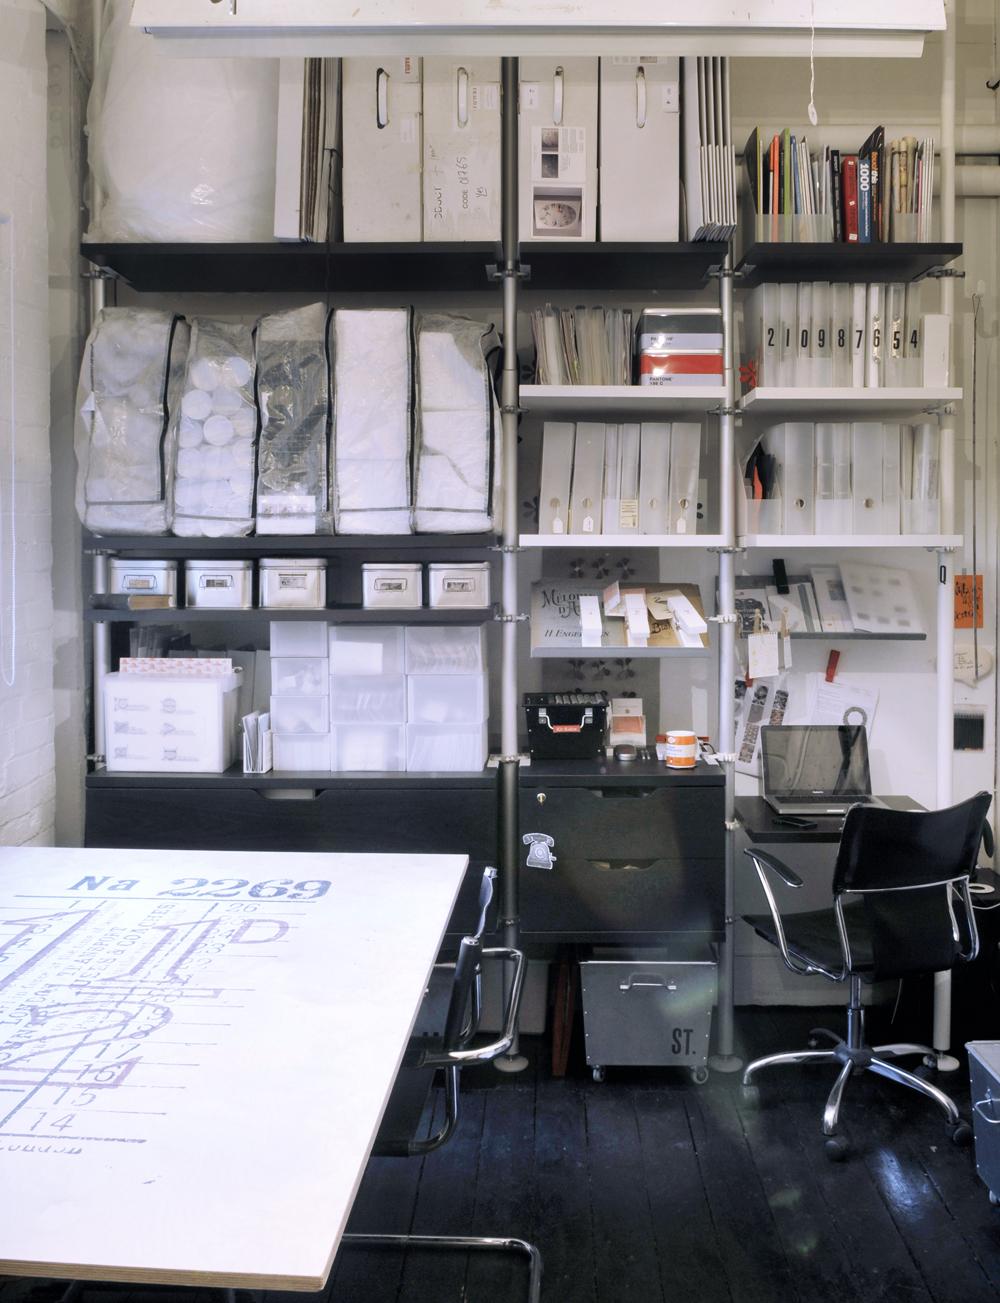 prieto-Francisca-studio-2.jpg